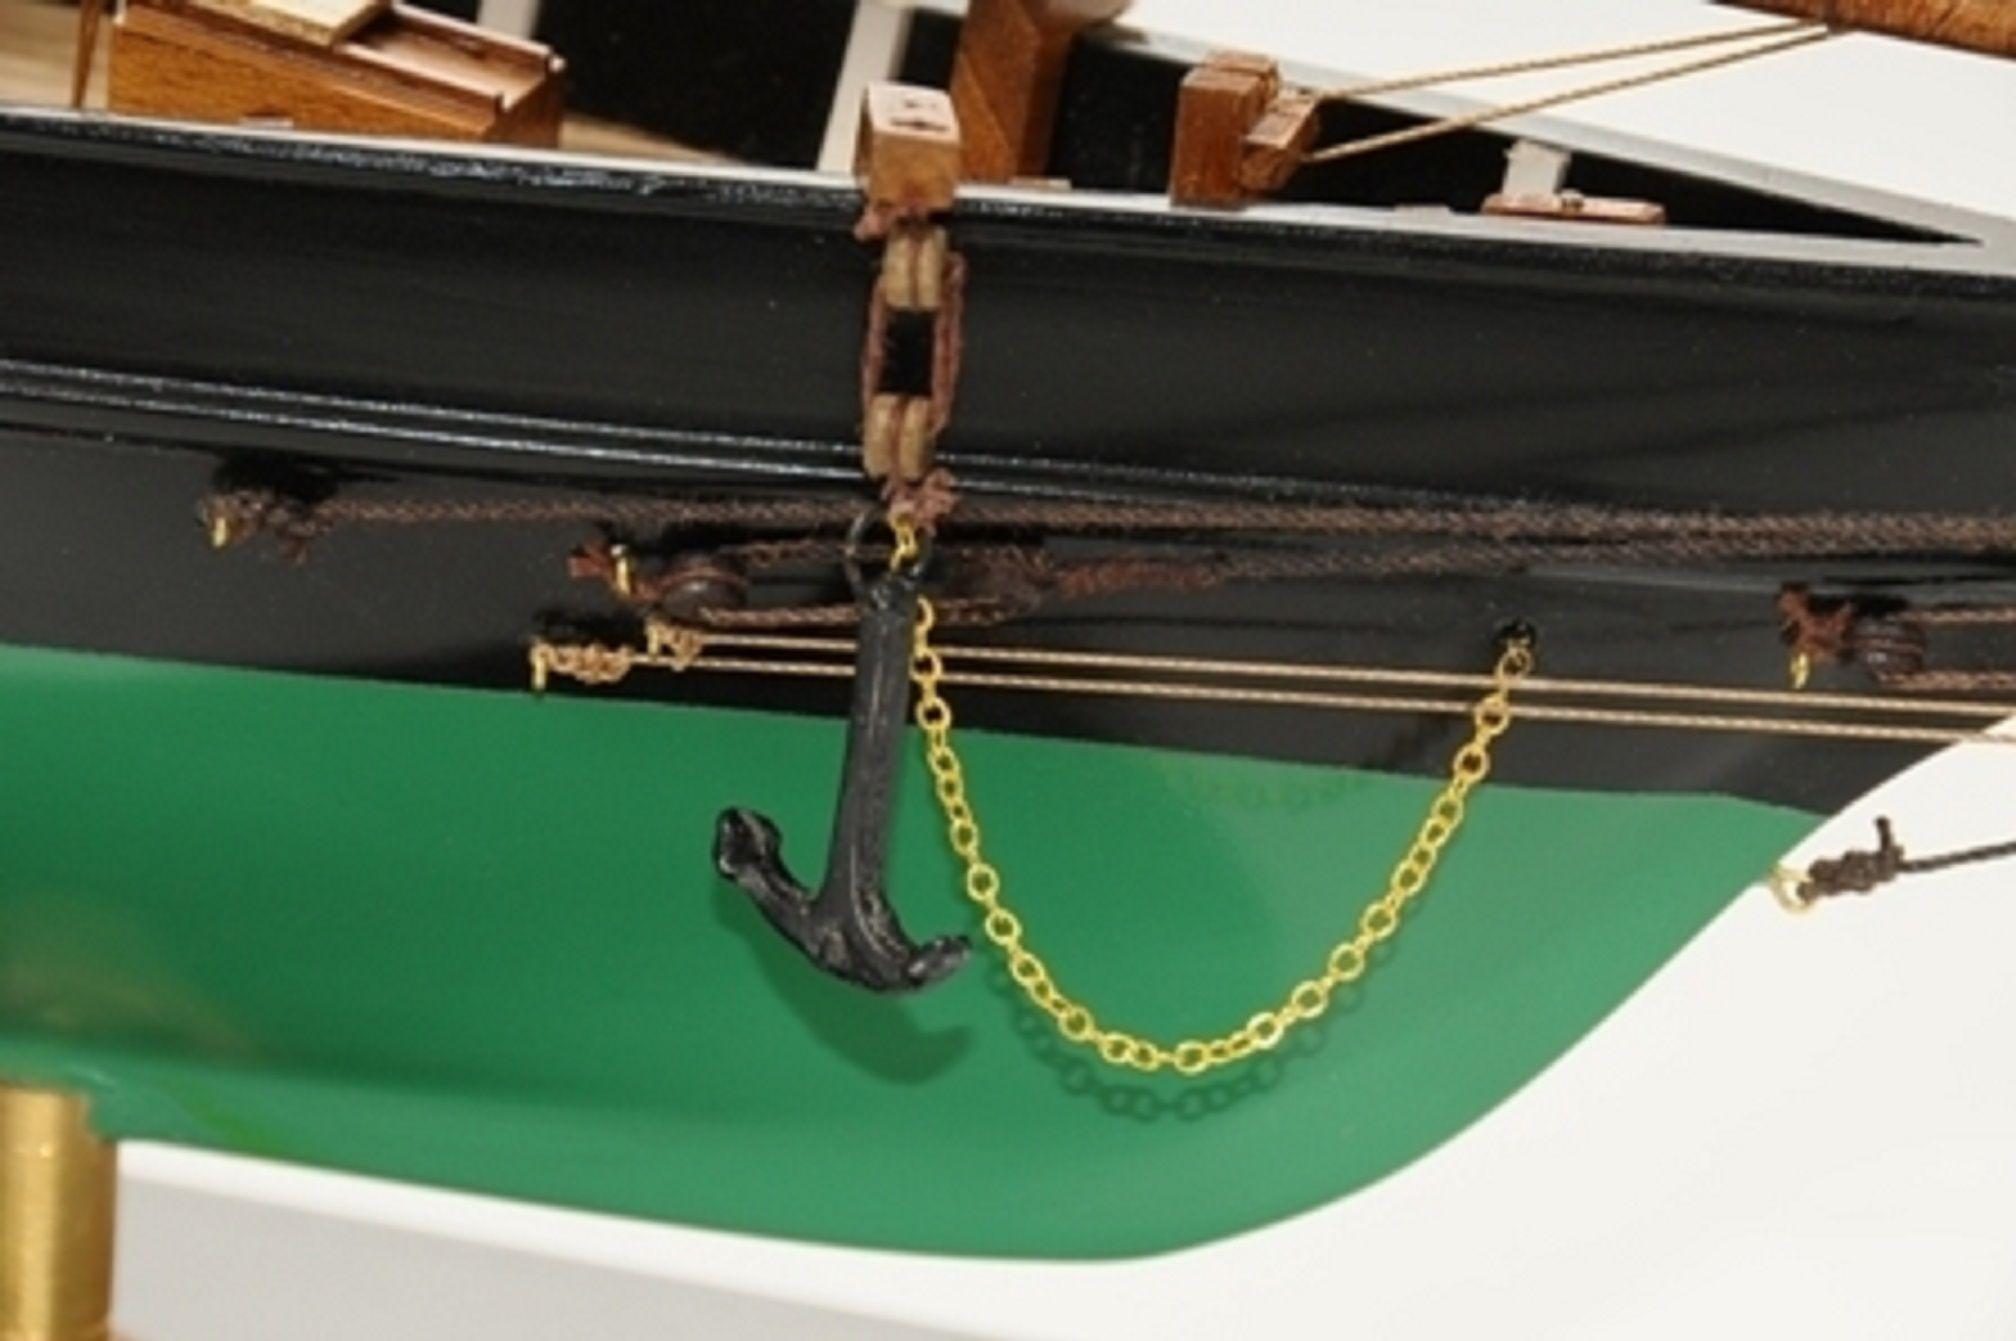 1419-7763-America-Model-Yacht-Superior-Range